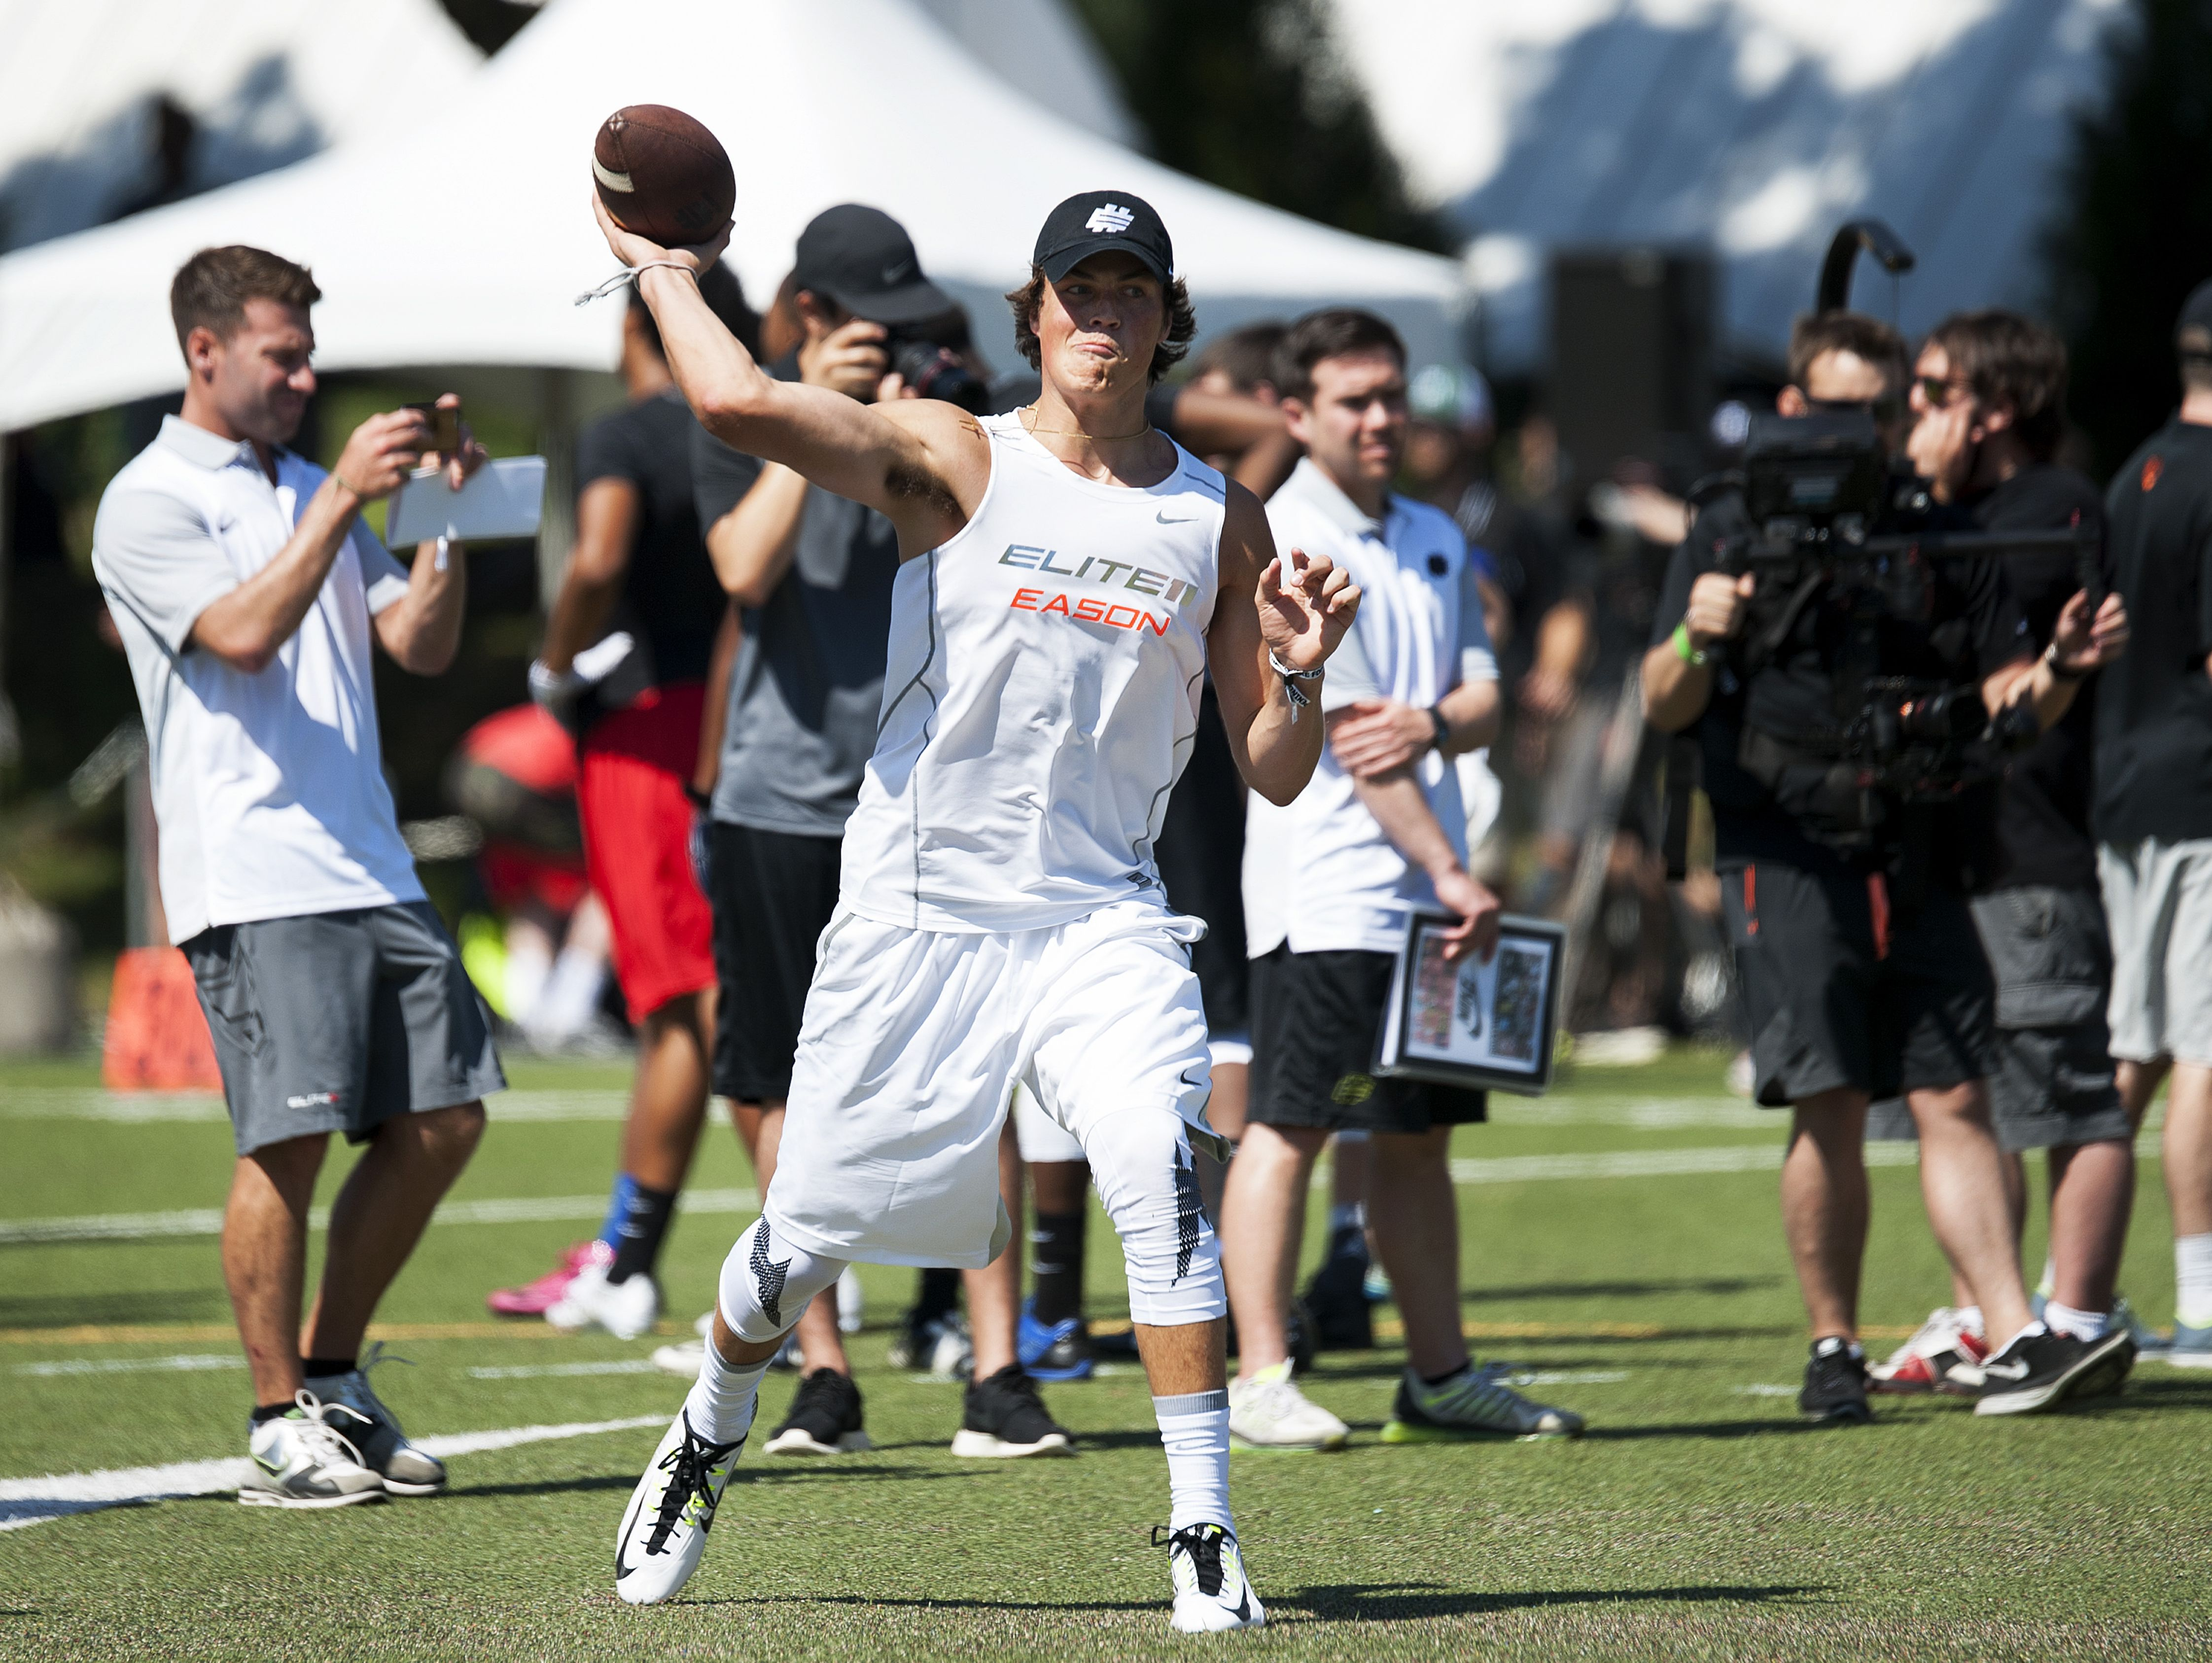 Lake Stevens quarterback Jacob Eason throws the ball during the Elite 11 football camp for high school football players.